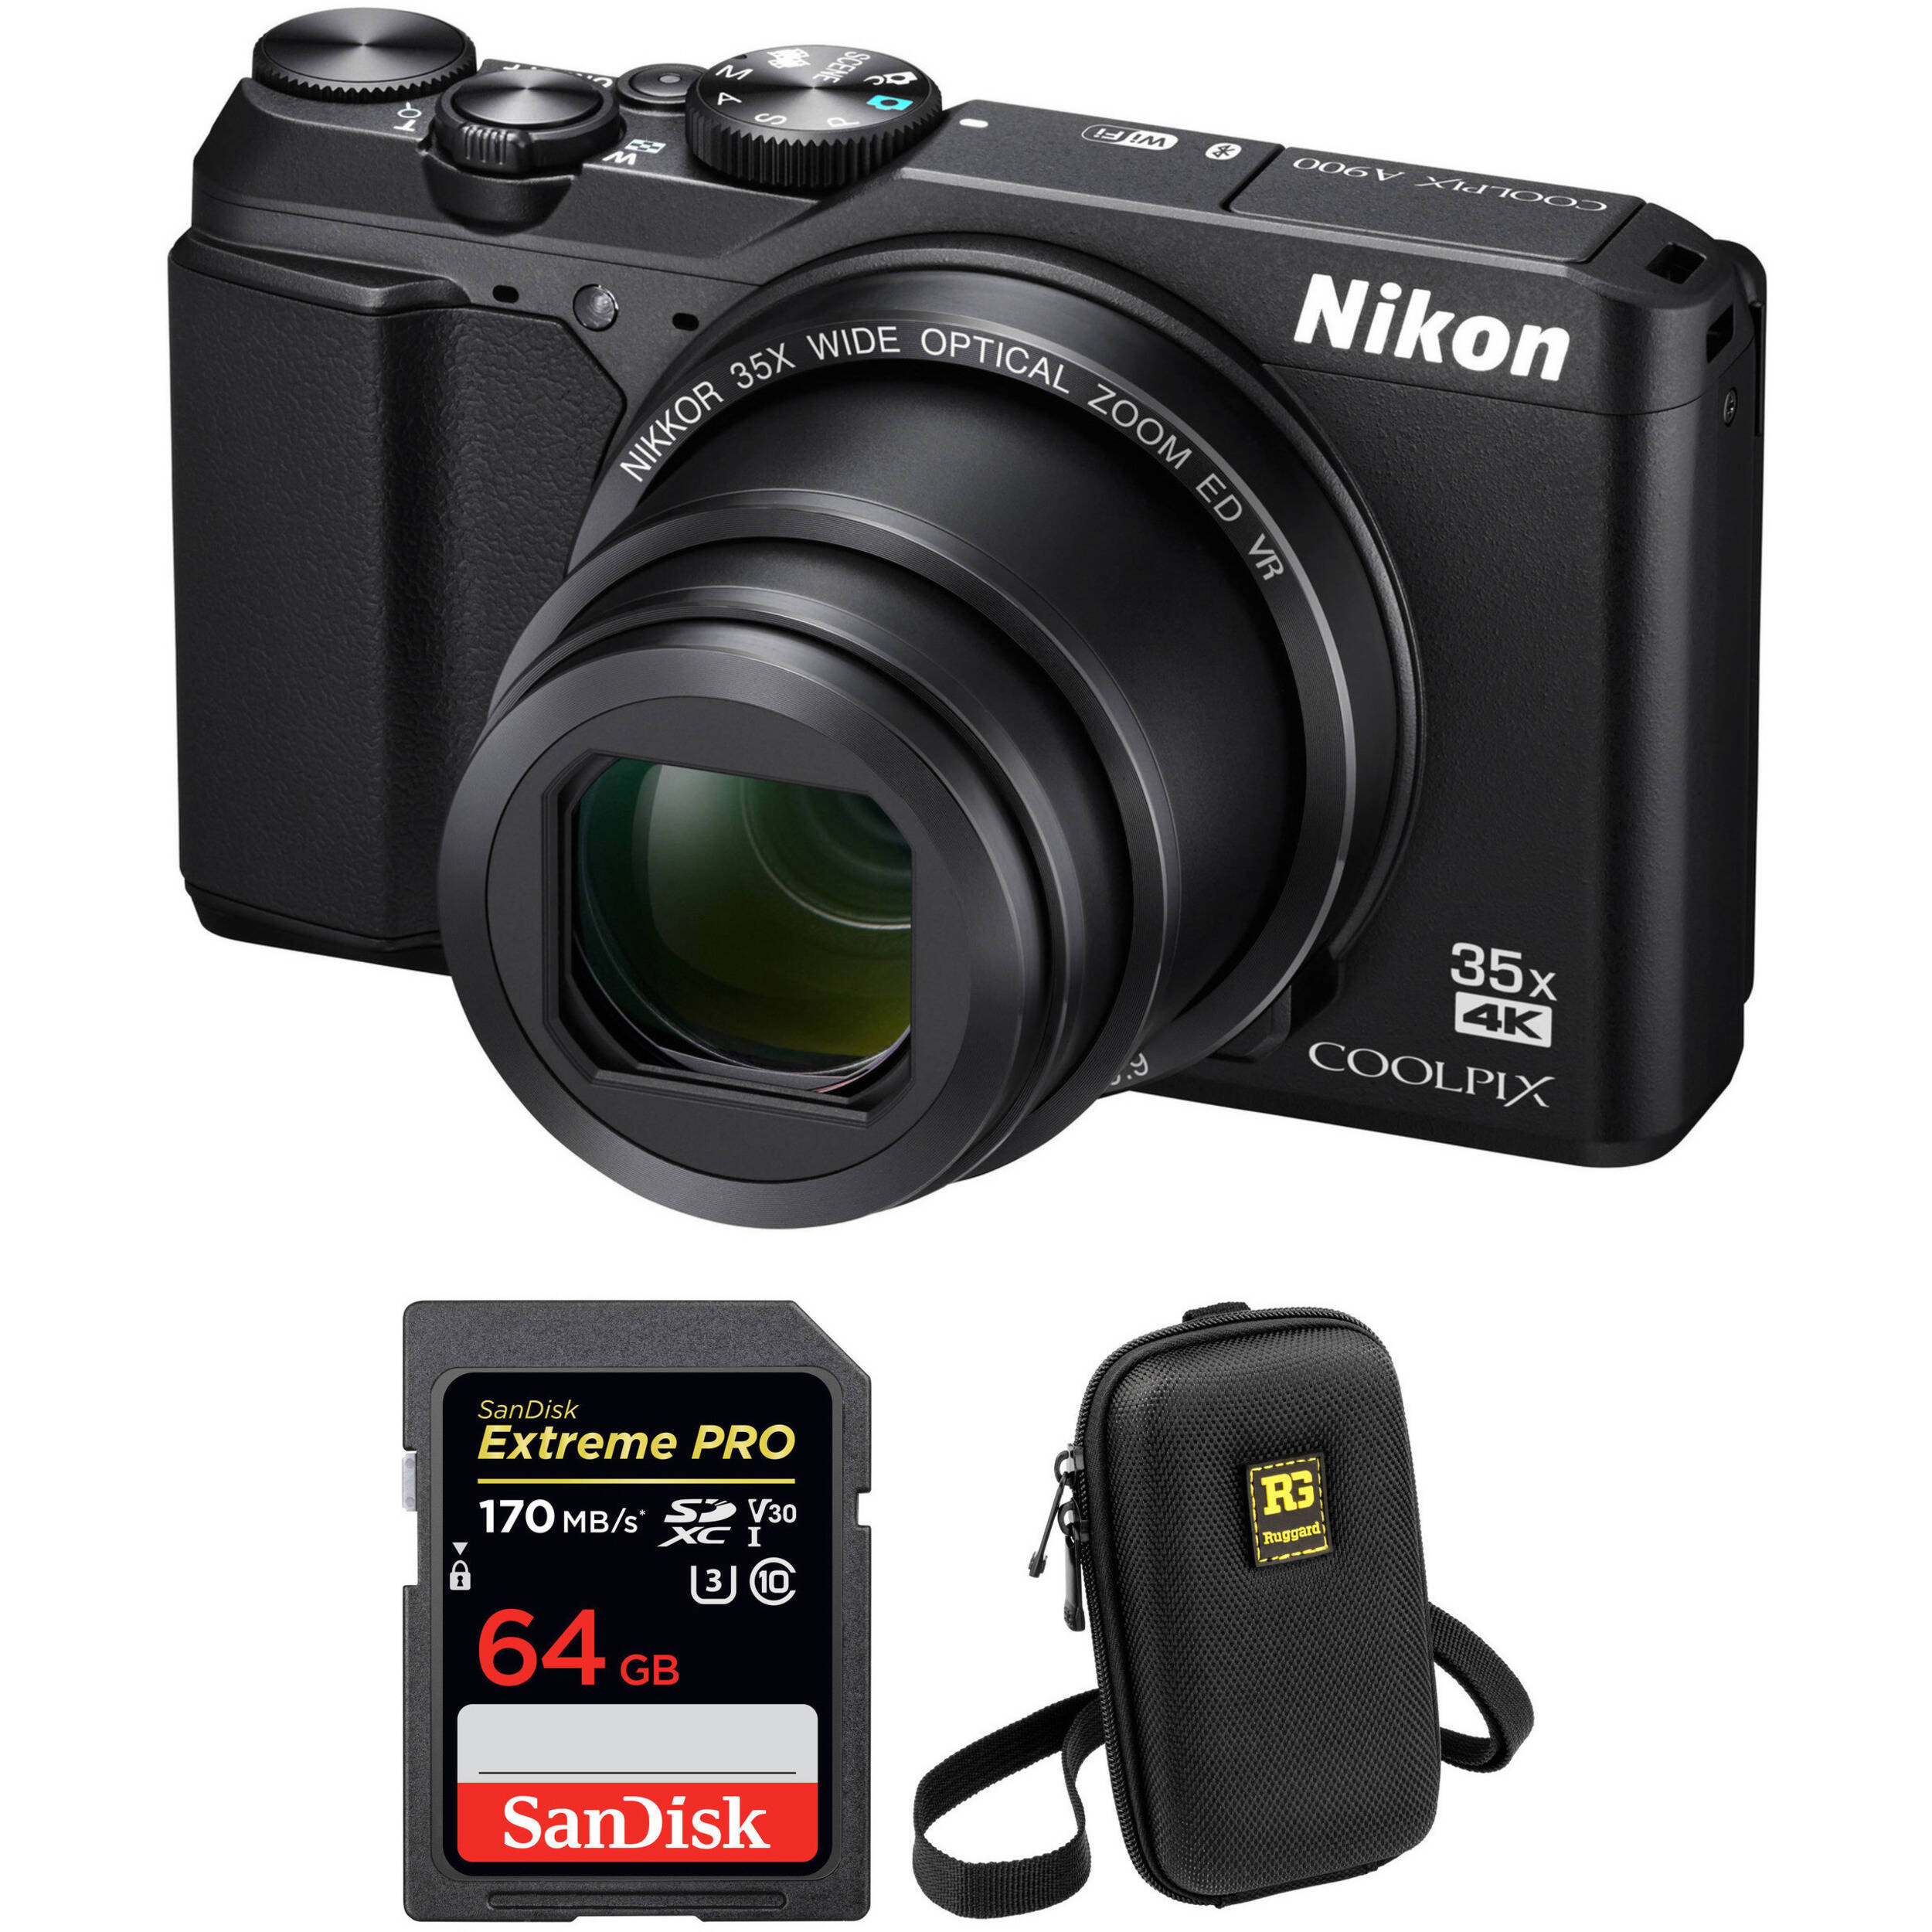 Nikon COOLPIX A900 Digital Camera With Free Accessory Kit Black